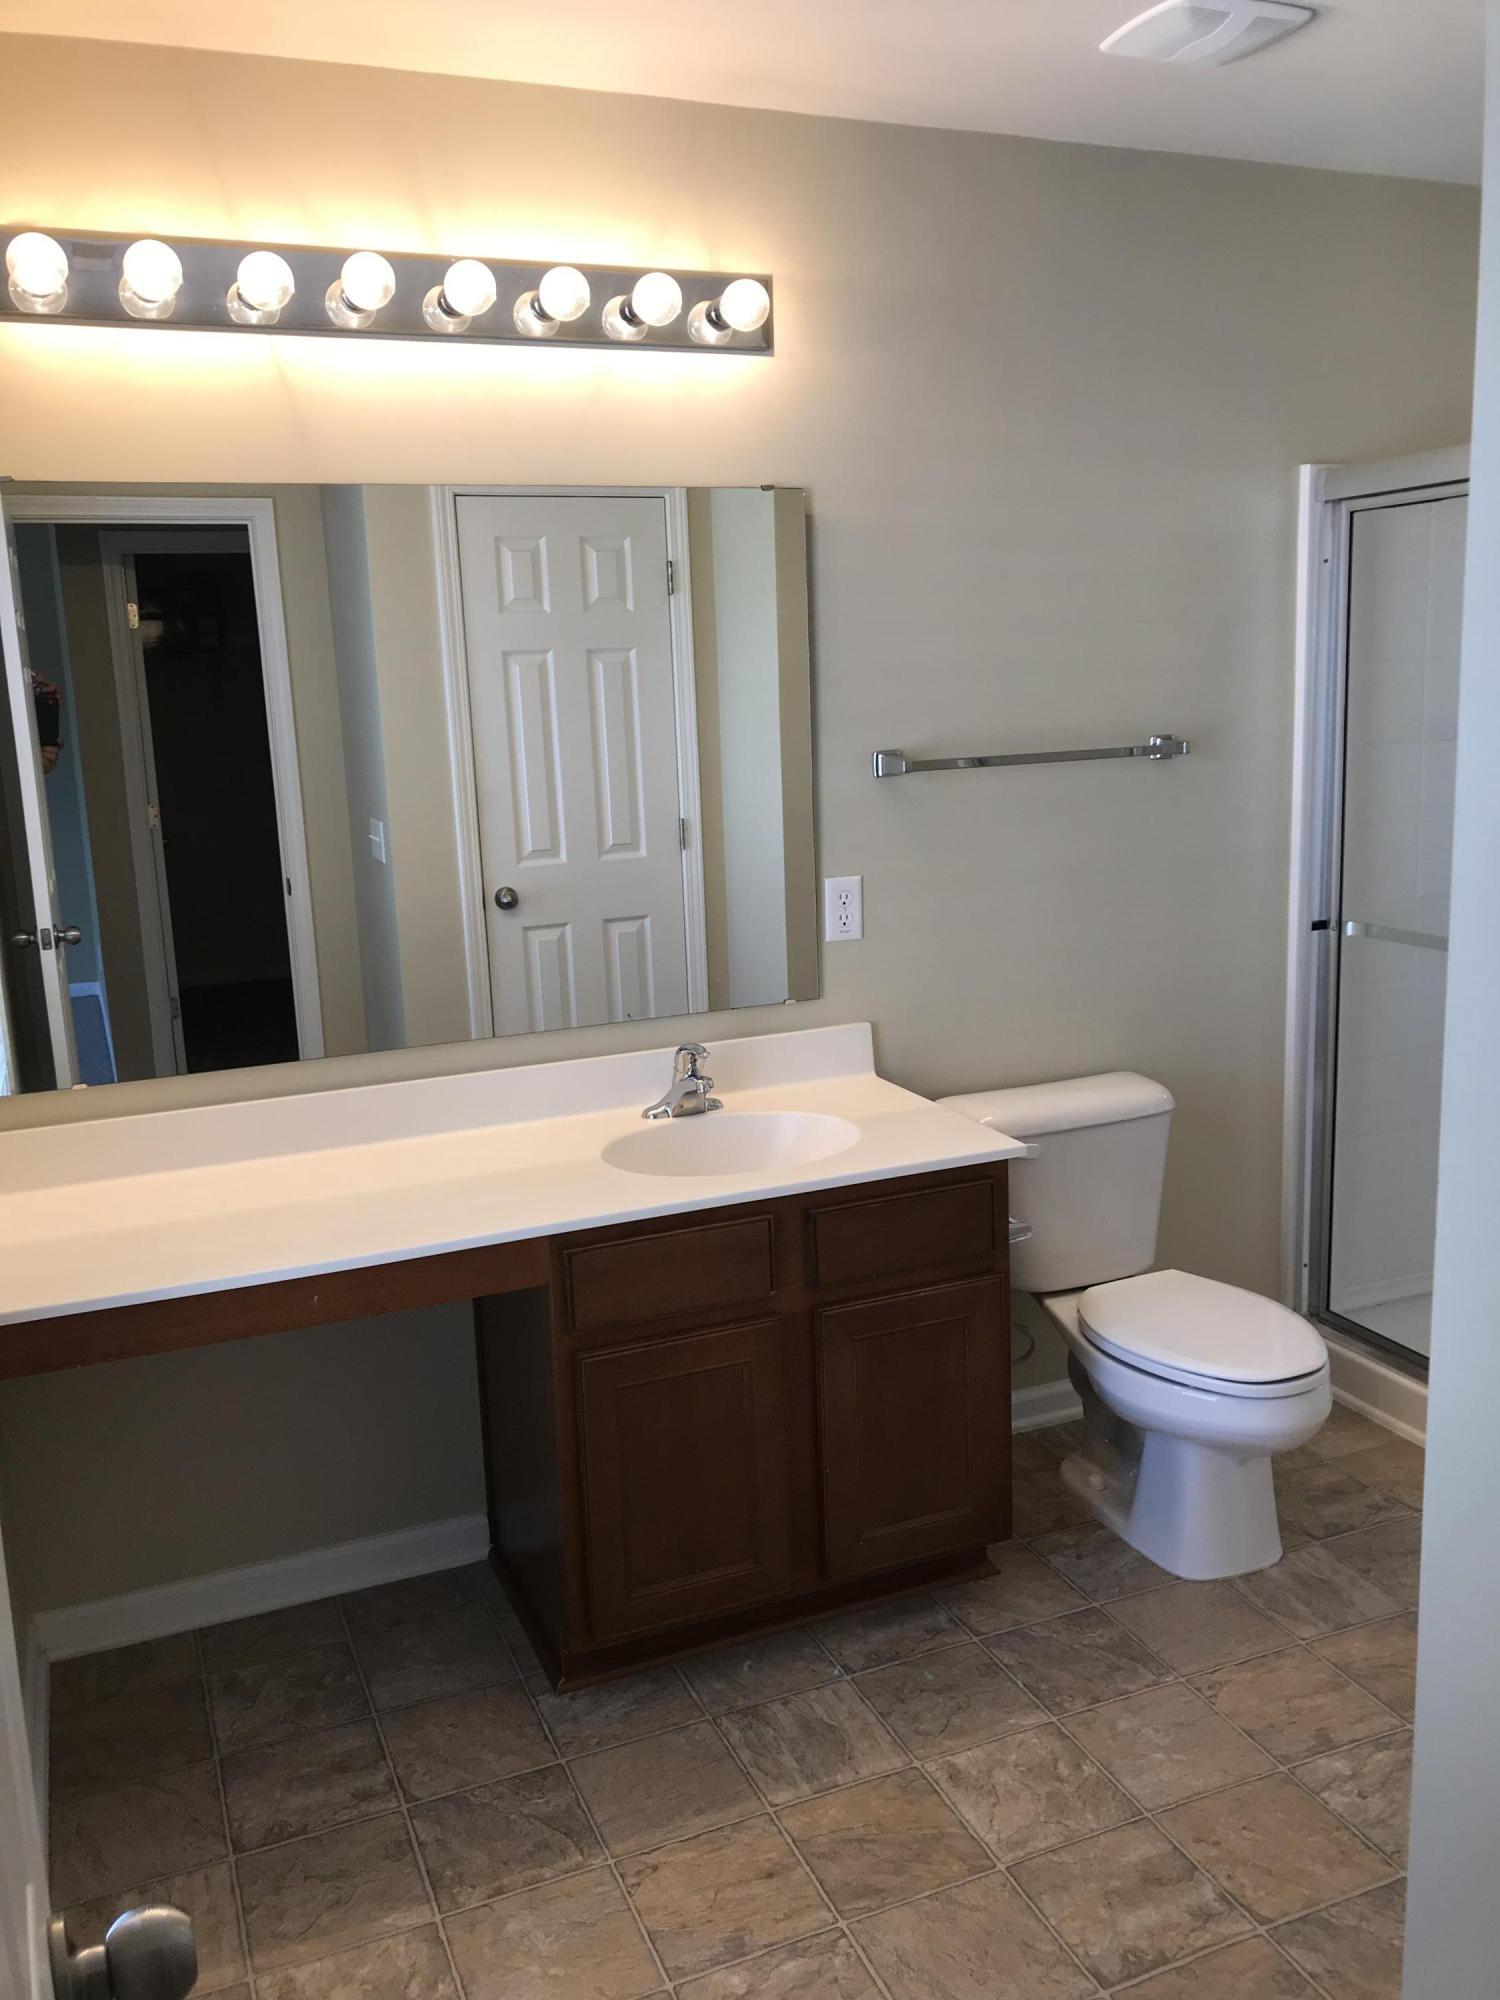 Cain Crossing Homes For Sale - 1006 Bennington, Charleston, SC - 3